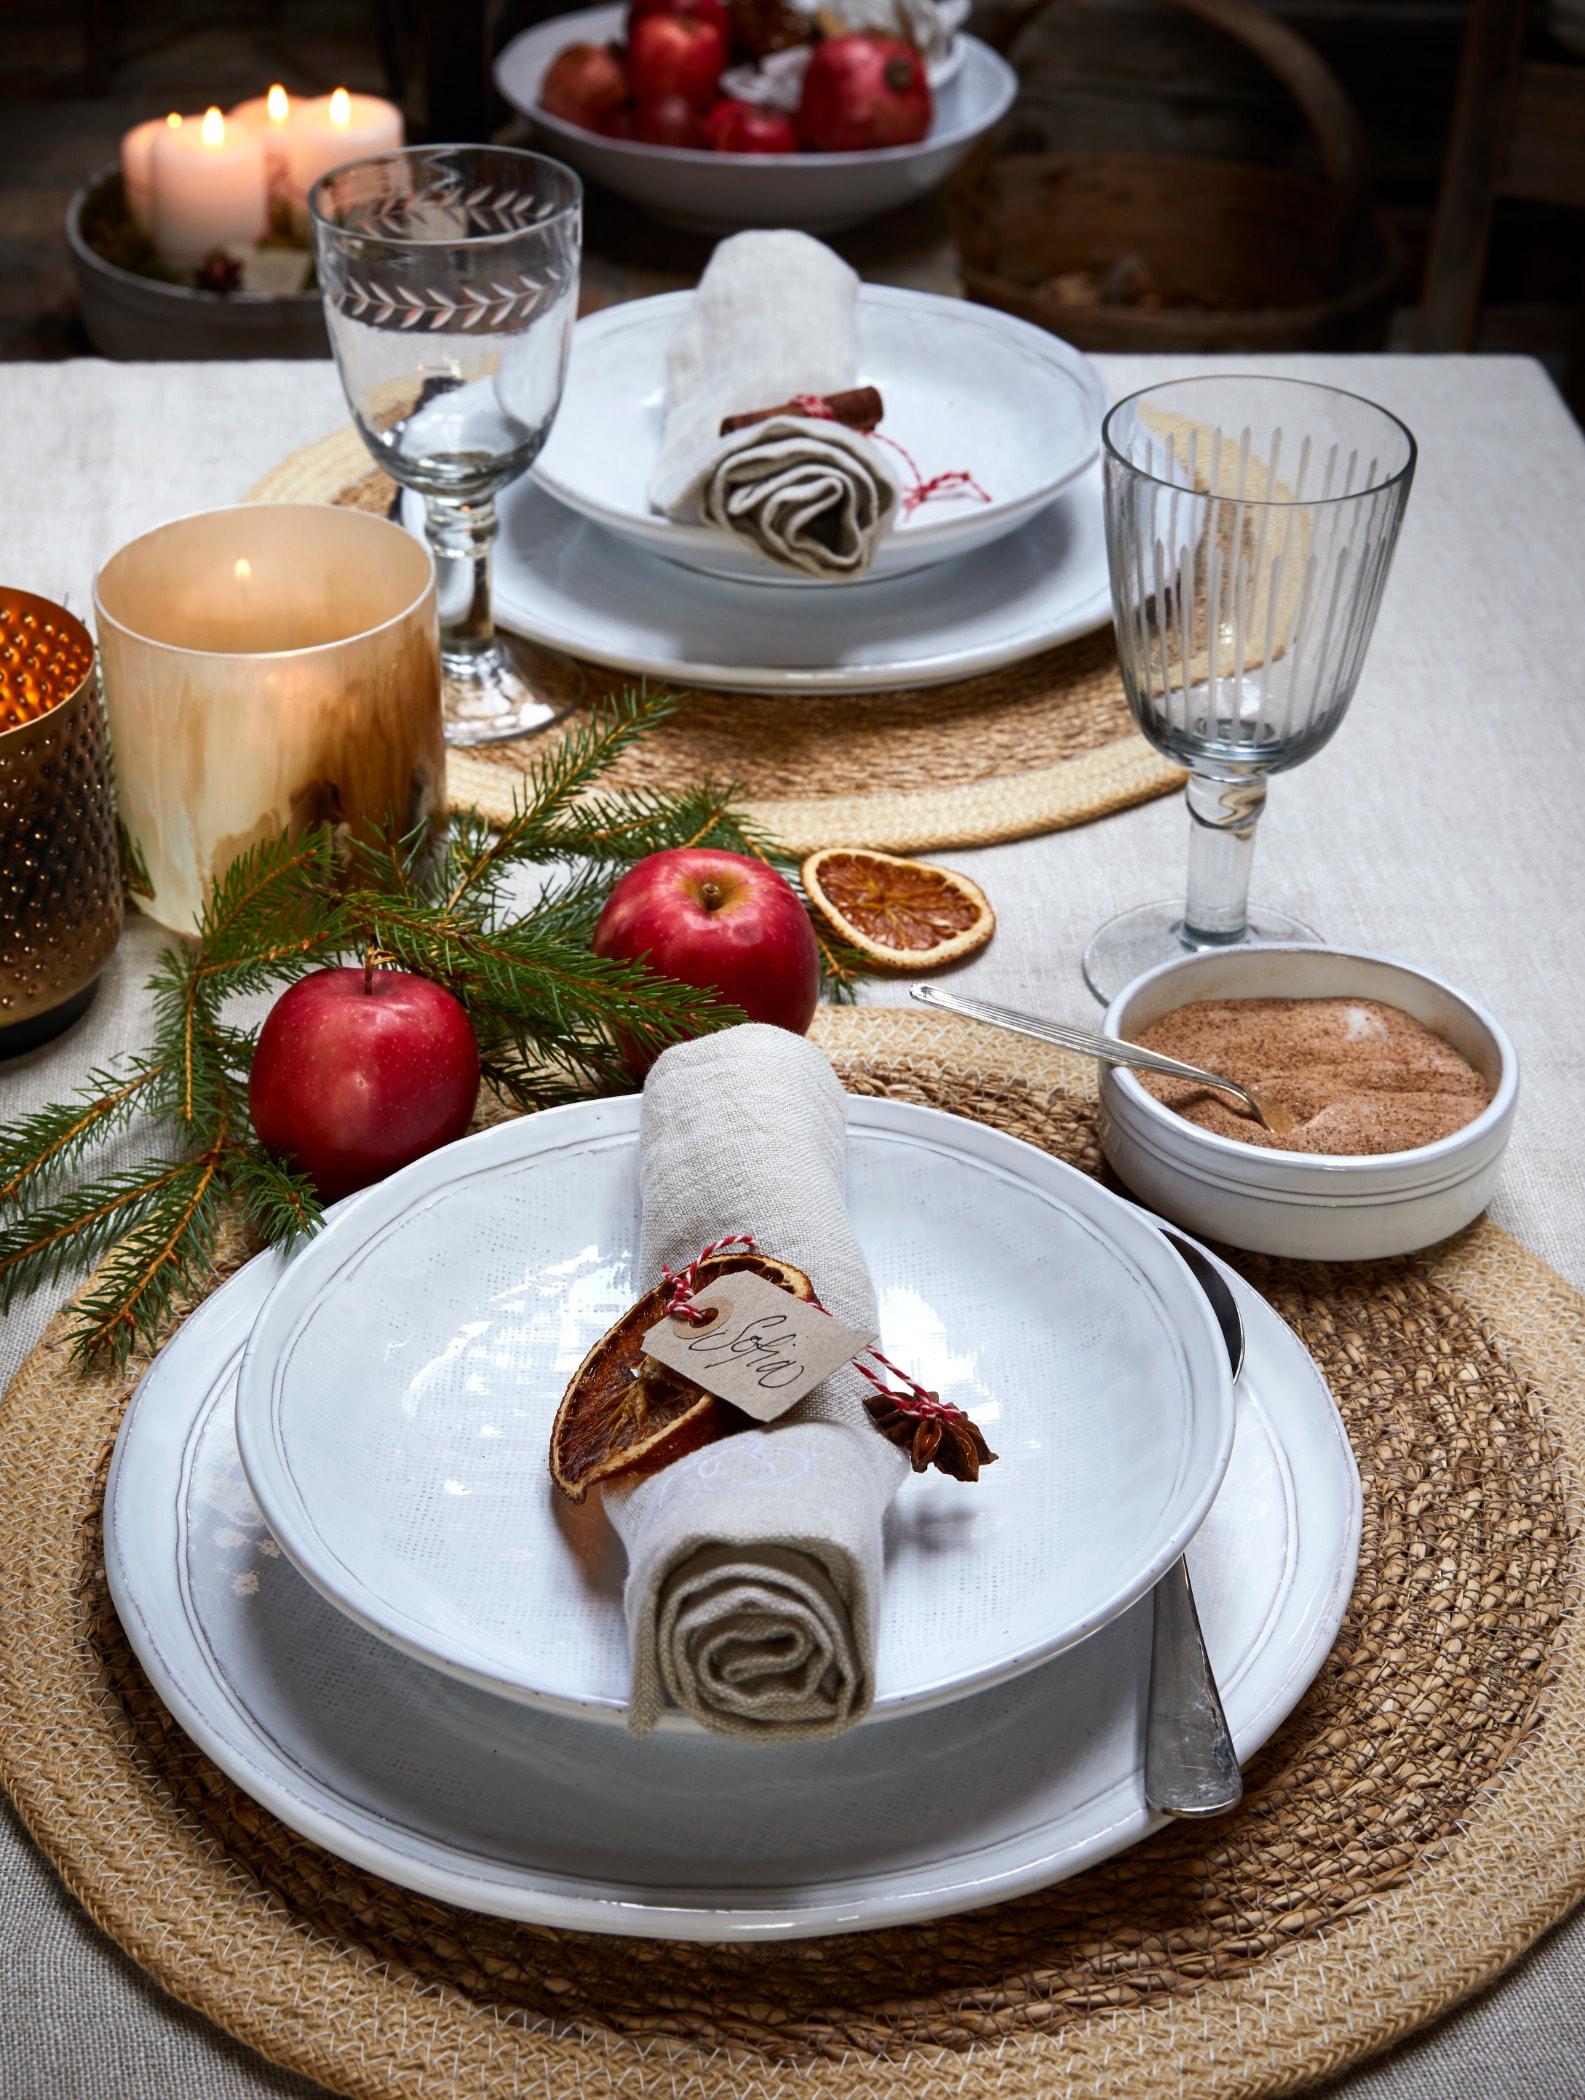 Breakfast, Meal, Ingredient, Dessert, Cuisine, Dish, Food